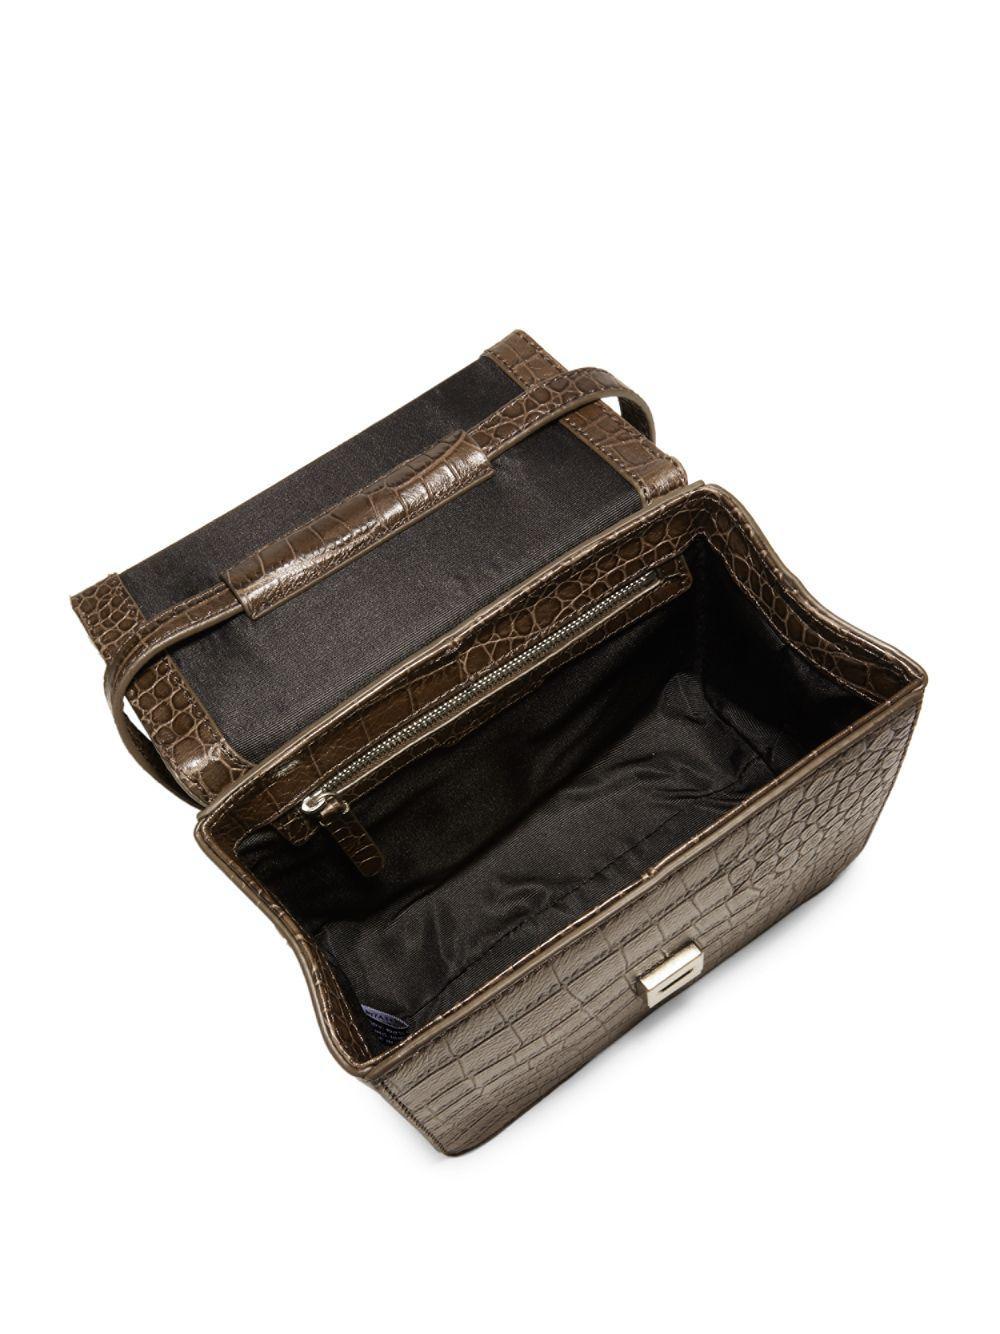 b4472ade7eab Steven Alan - Brown Classic Embossed Leather Crossbody Bag - Lyst. View  fullscreen